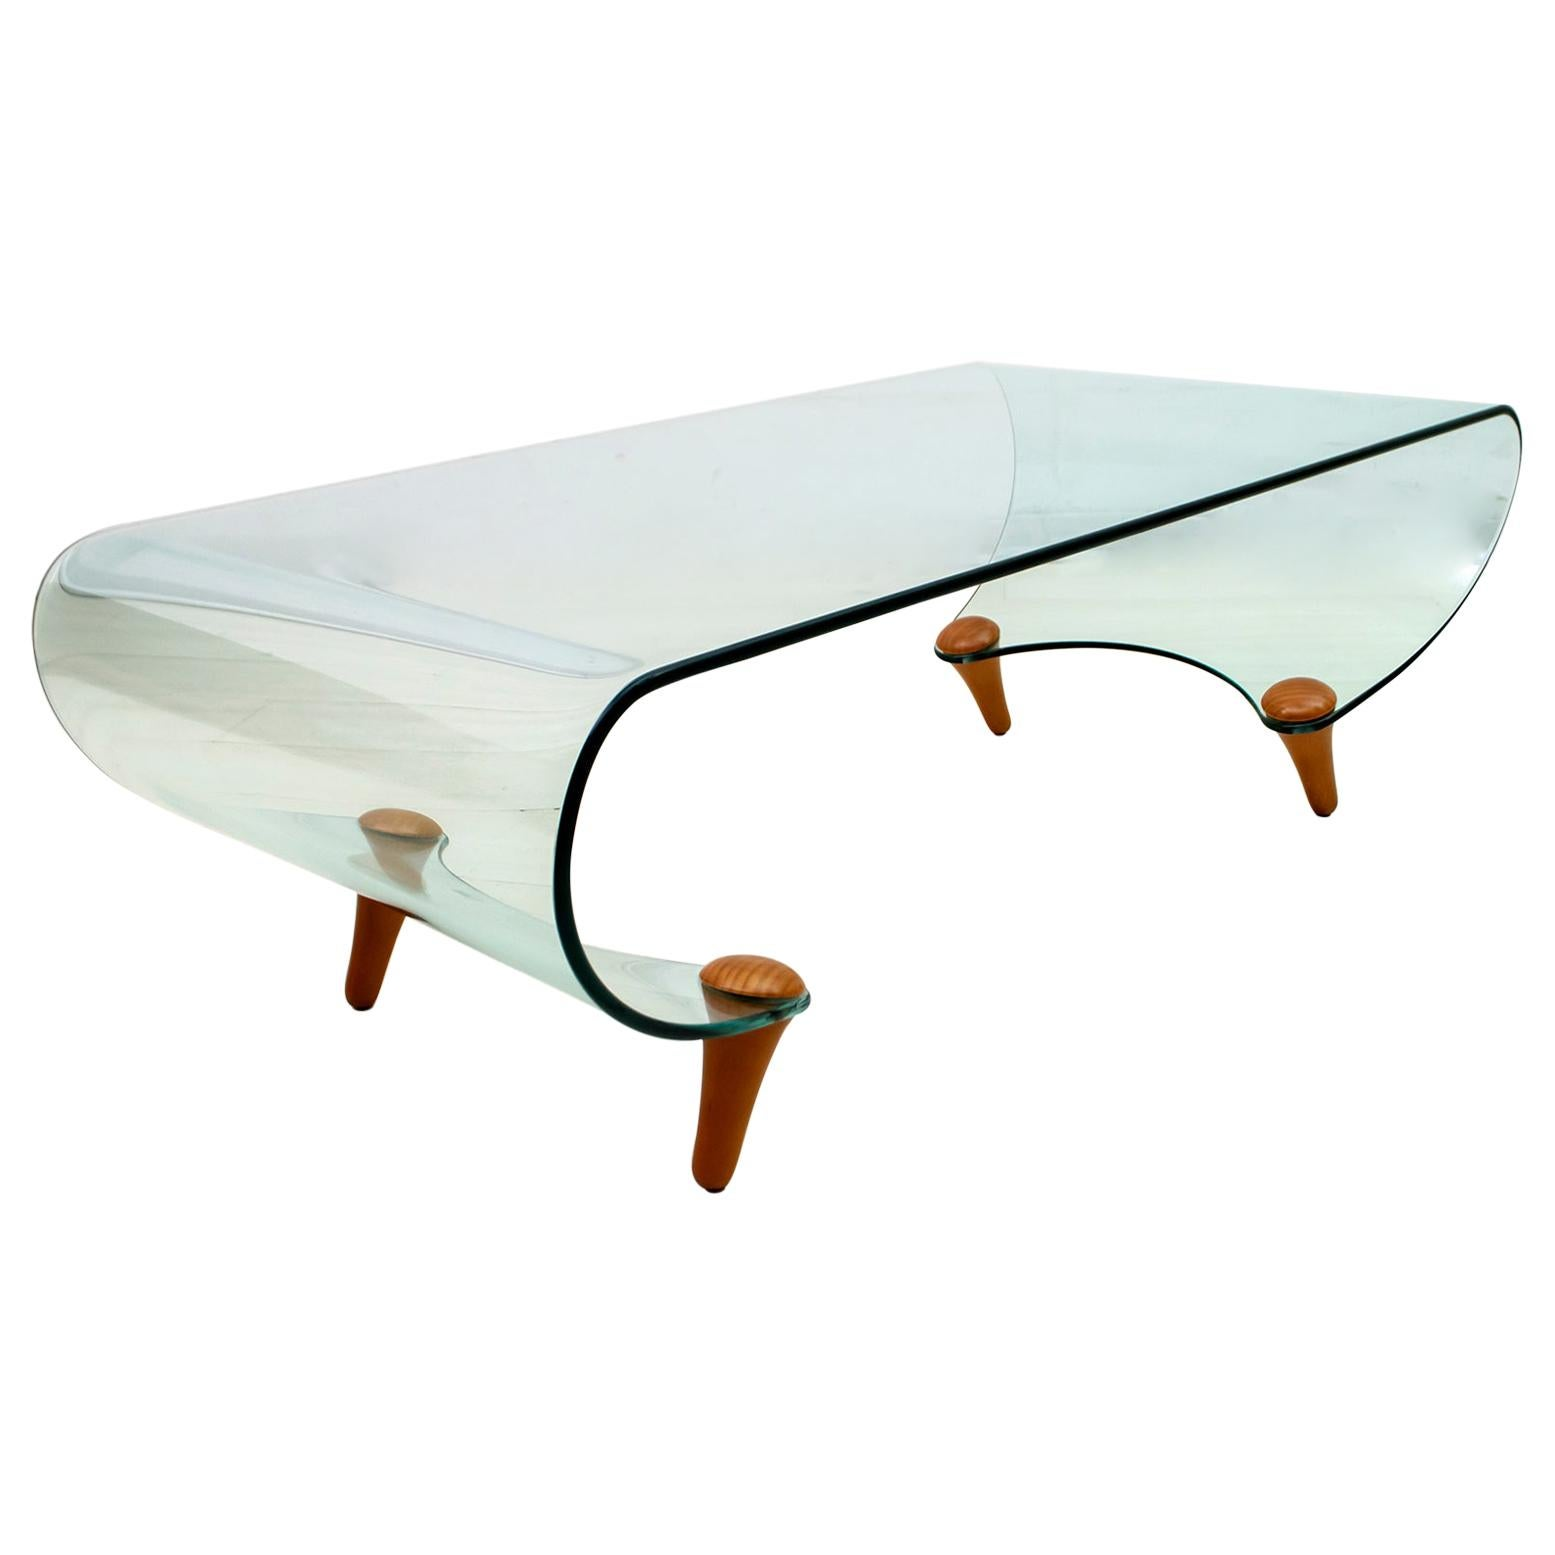 "Postmodern Fabio Di Bartolomei Curved Glass Coffee Table ""Tango"" by Fiam Italia"